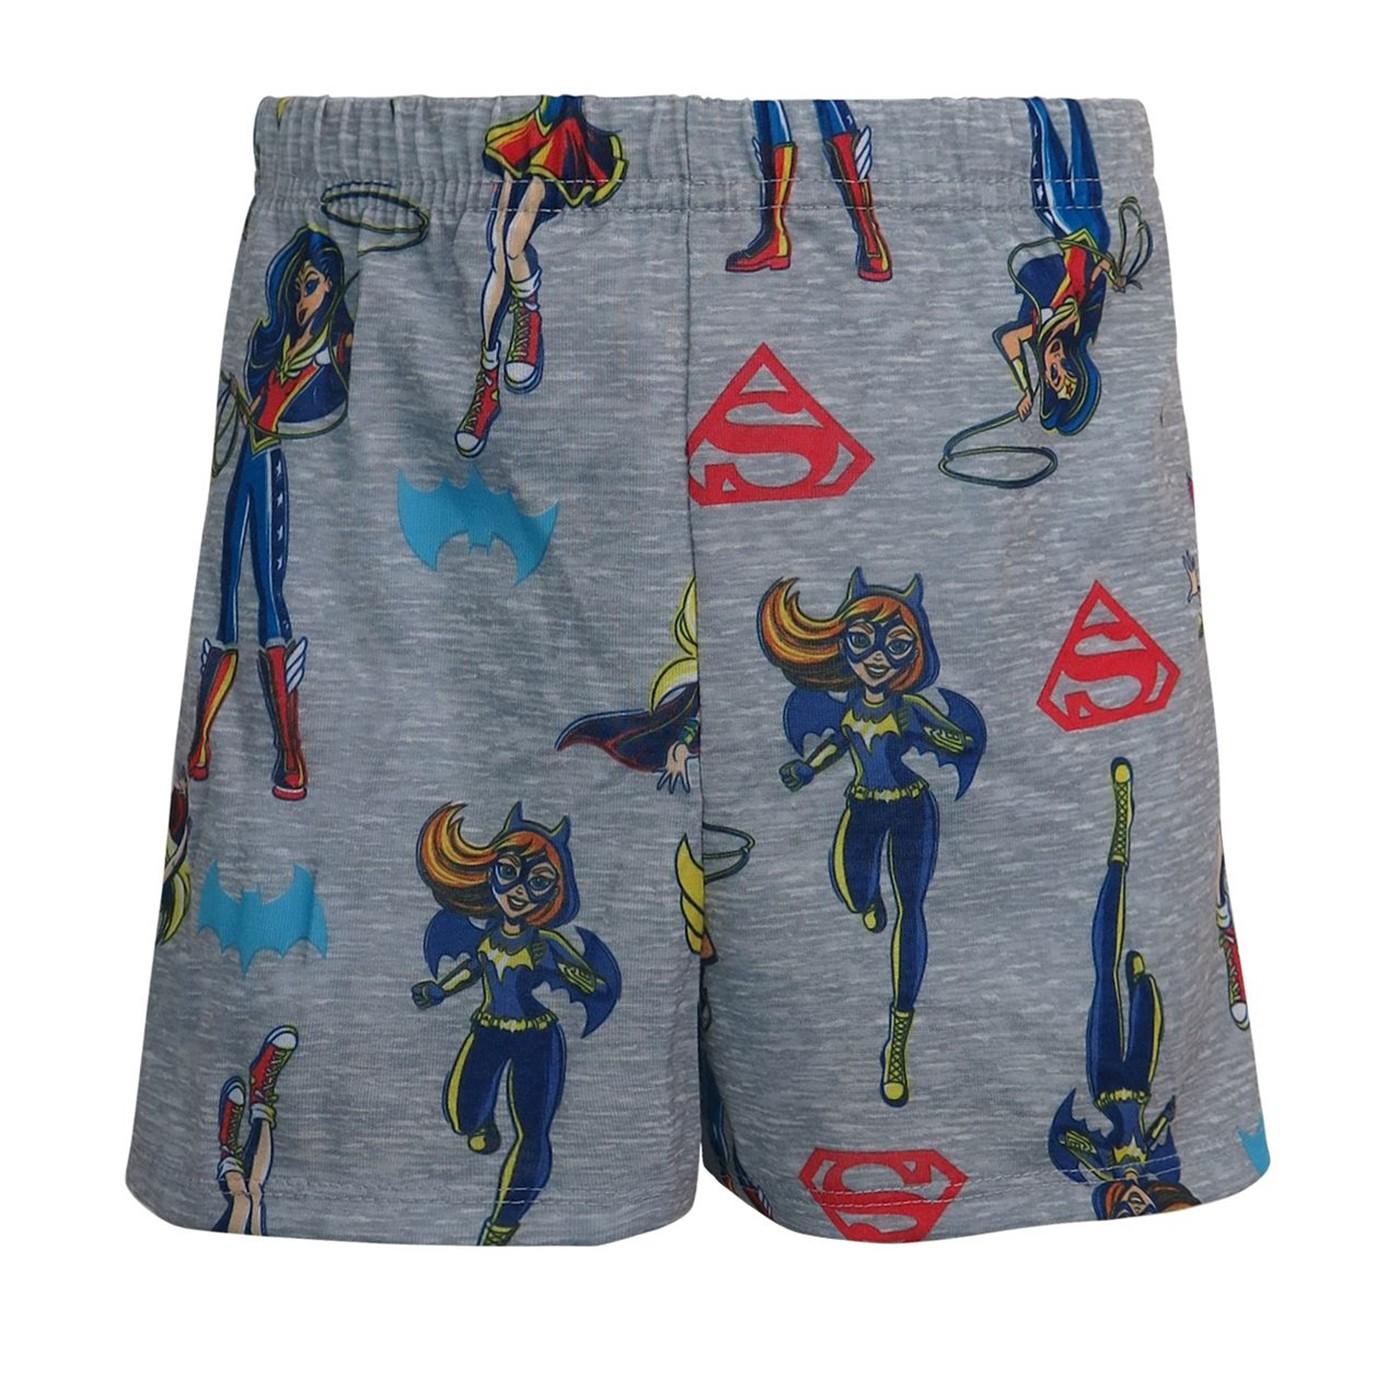 DC Superhero Girls Girl Power Juvenile Top & Short Set